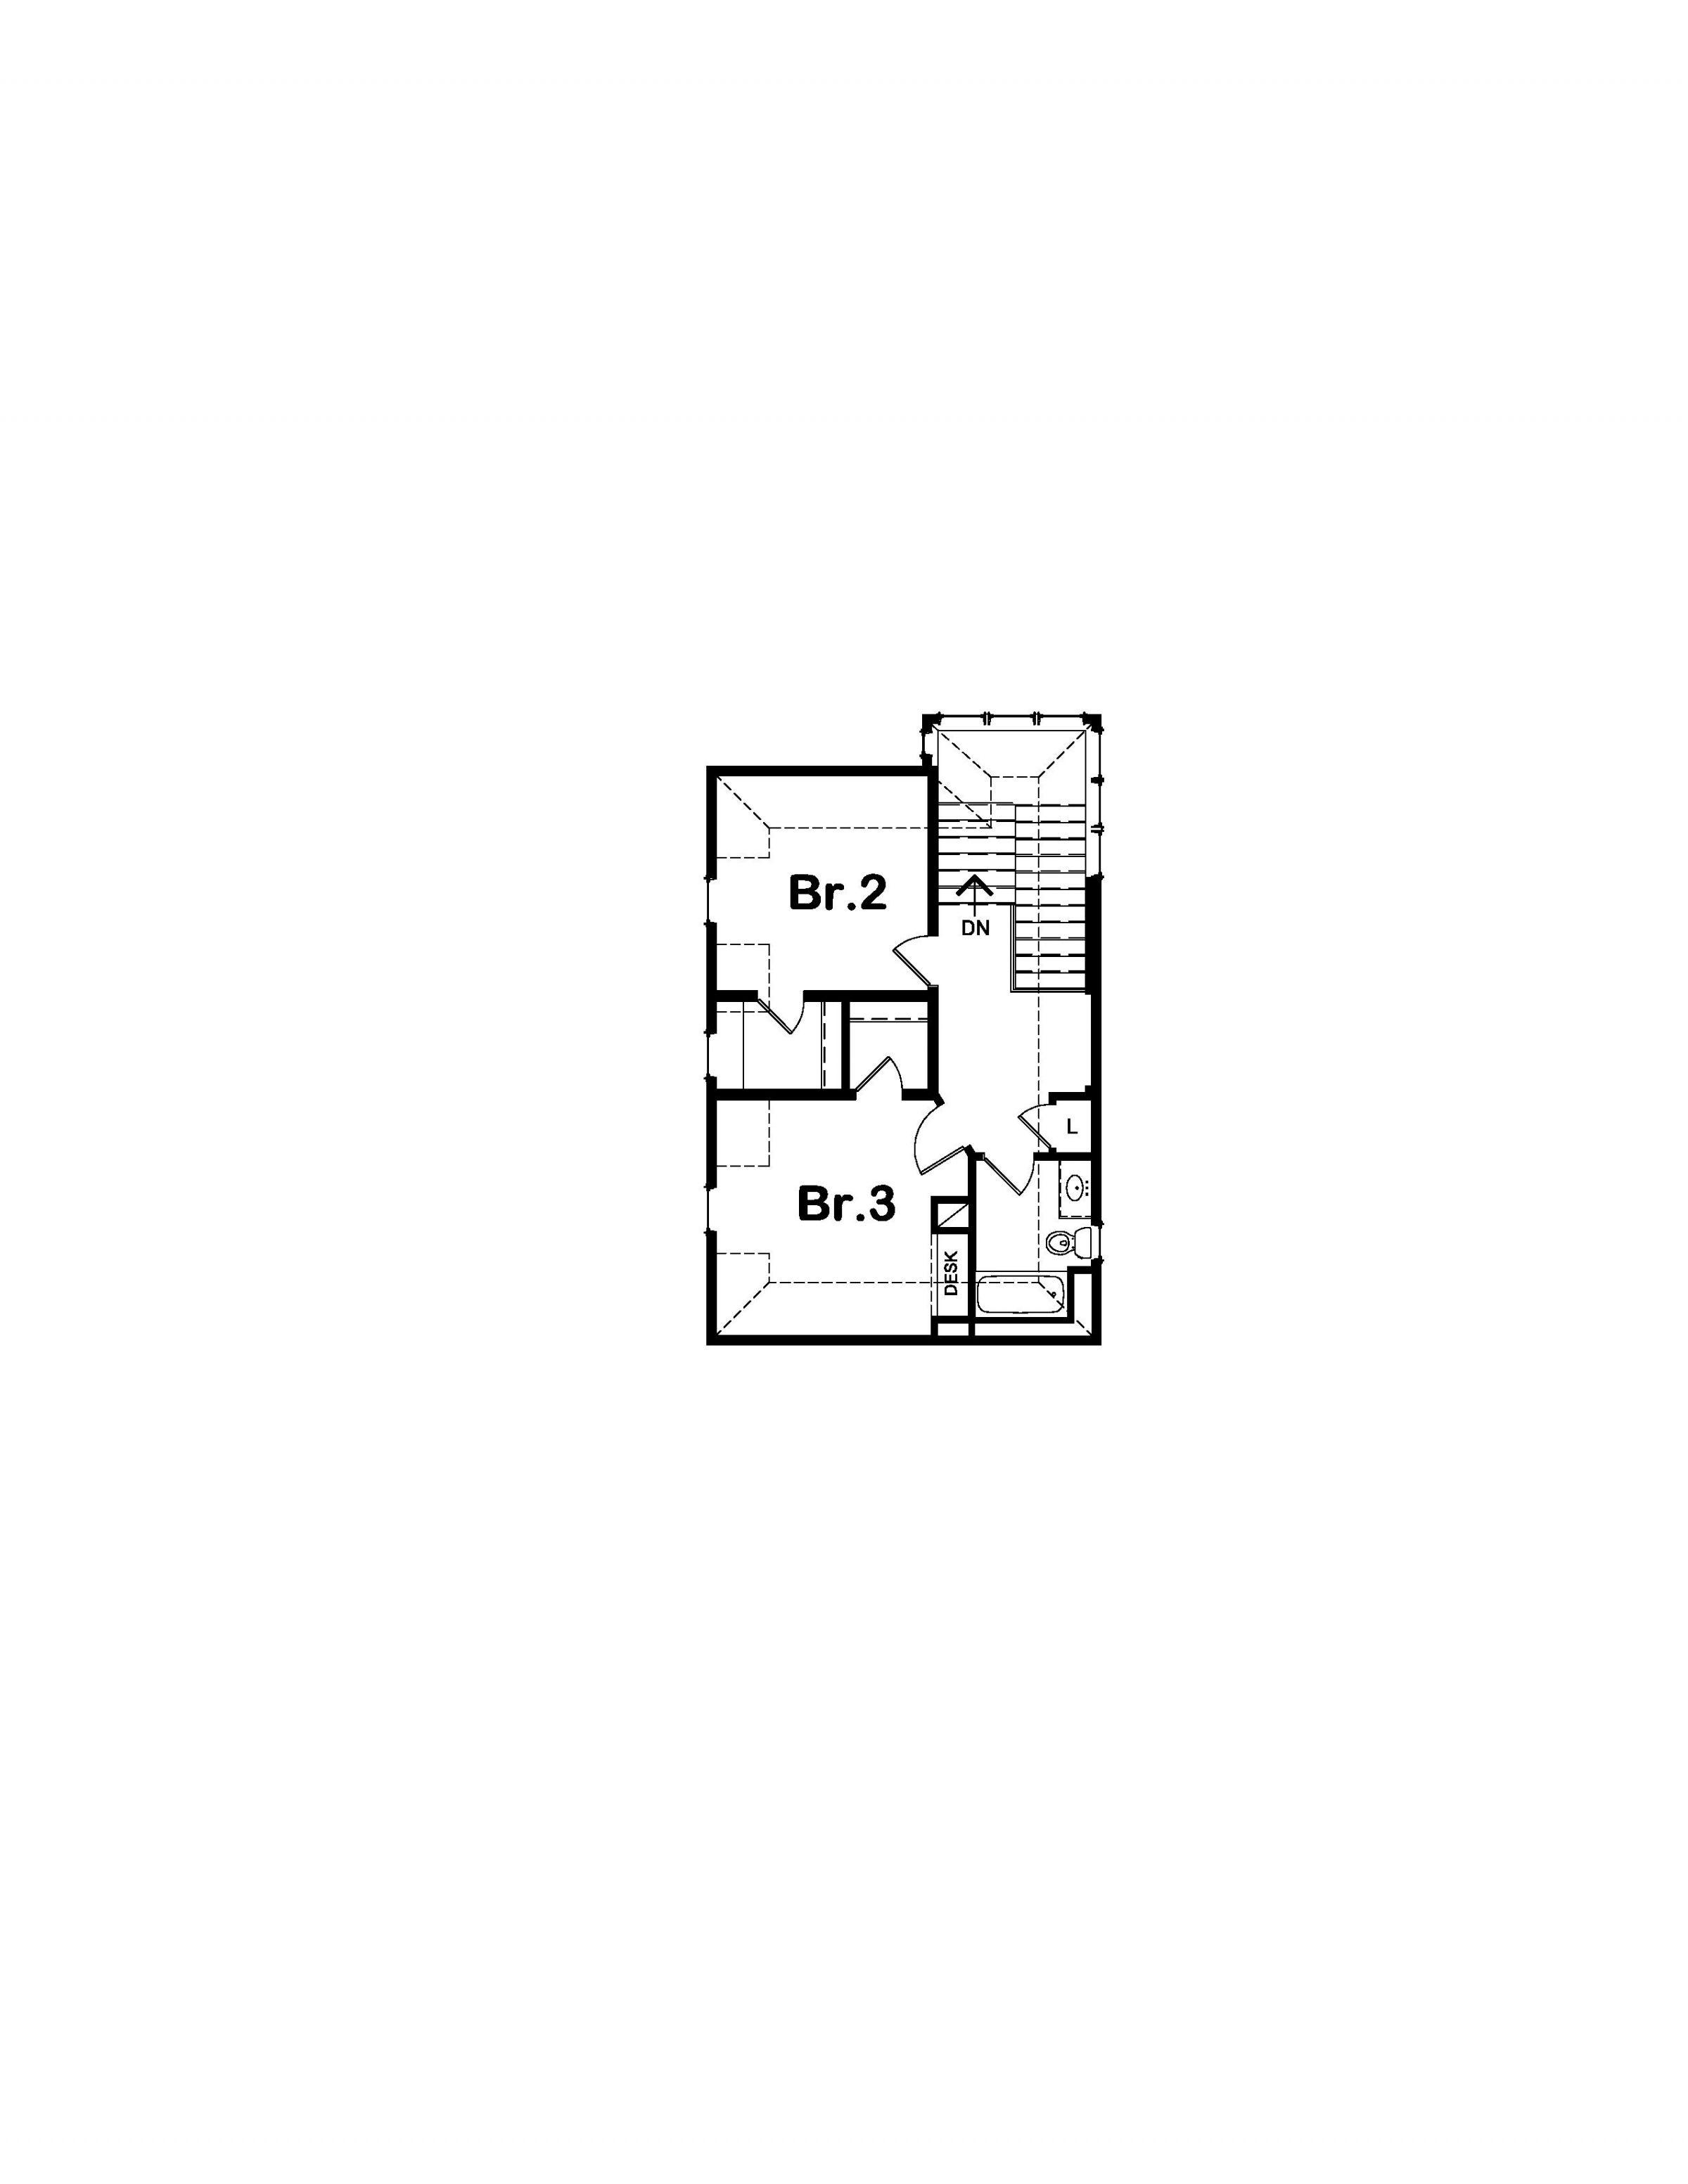 residential-warren-county-iowa-1-acres-listing-number-15524-3-2021-05-27-201728.jpg